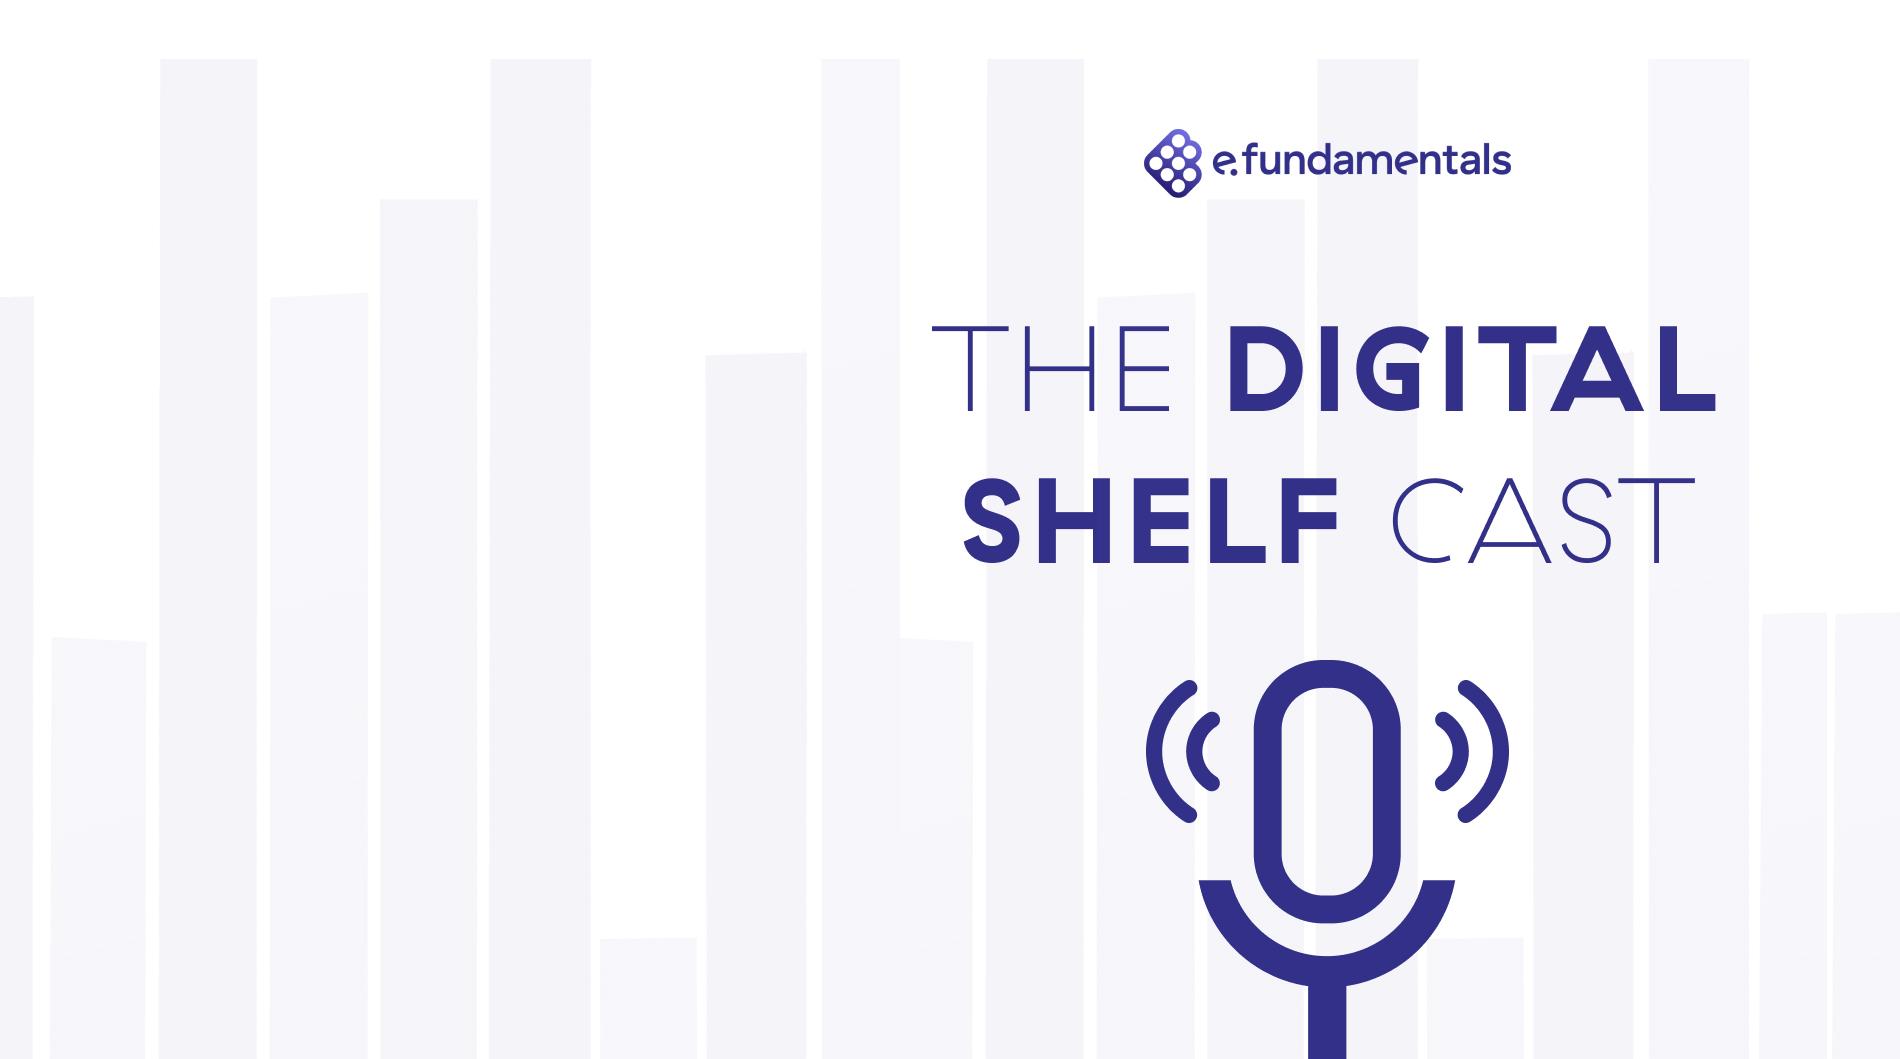 The Digital Shelf Cast Podcast. Ecommerce in Europe, Spotlight Germany #3